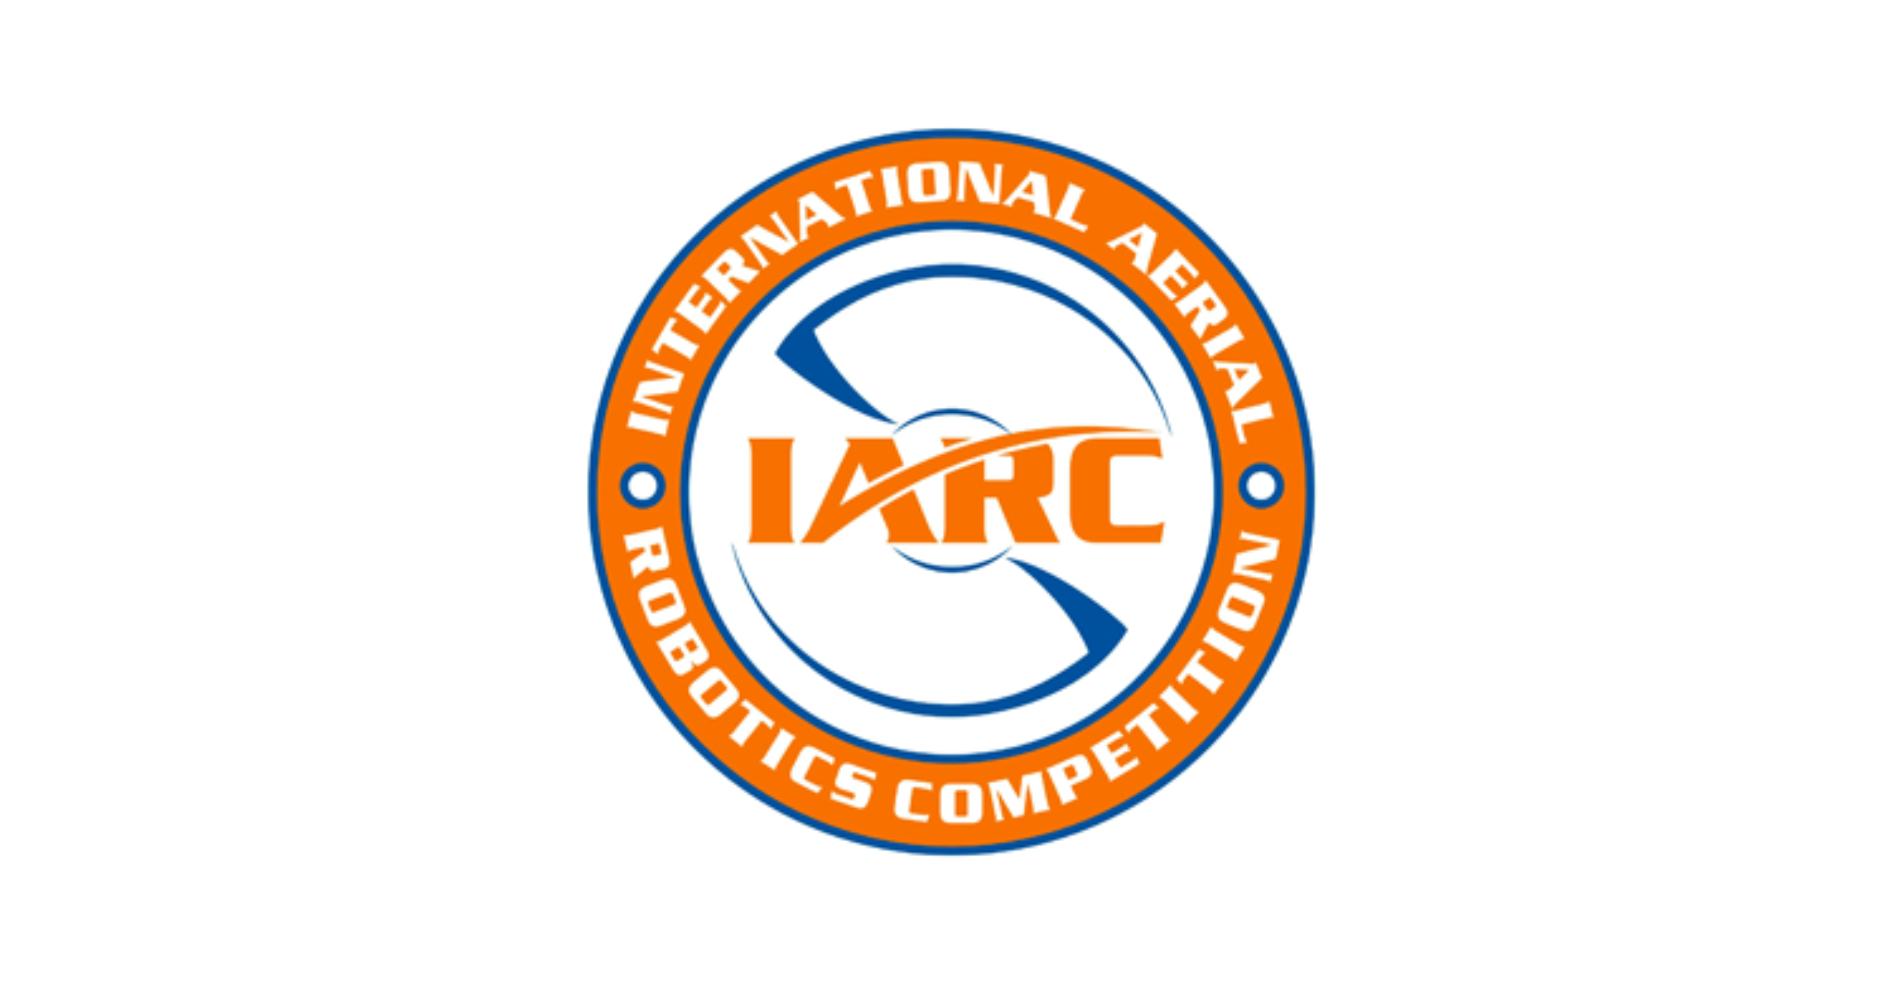 Missouri Robotics Team Competed in International Drone Racing